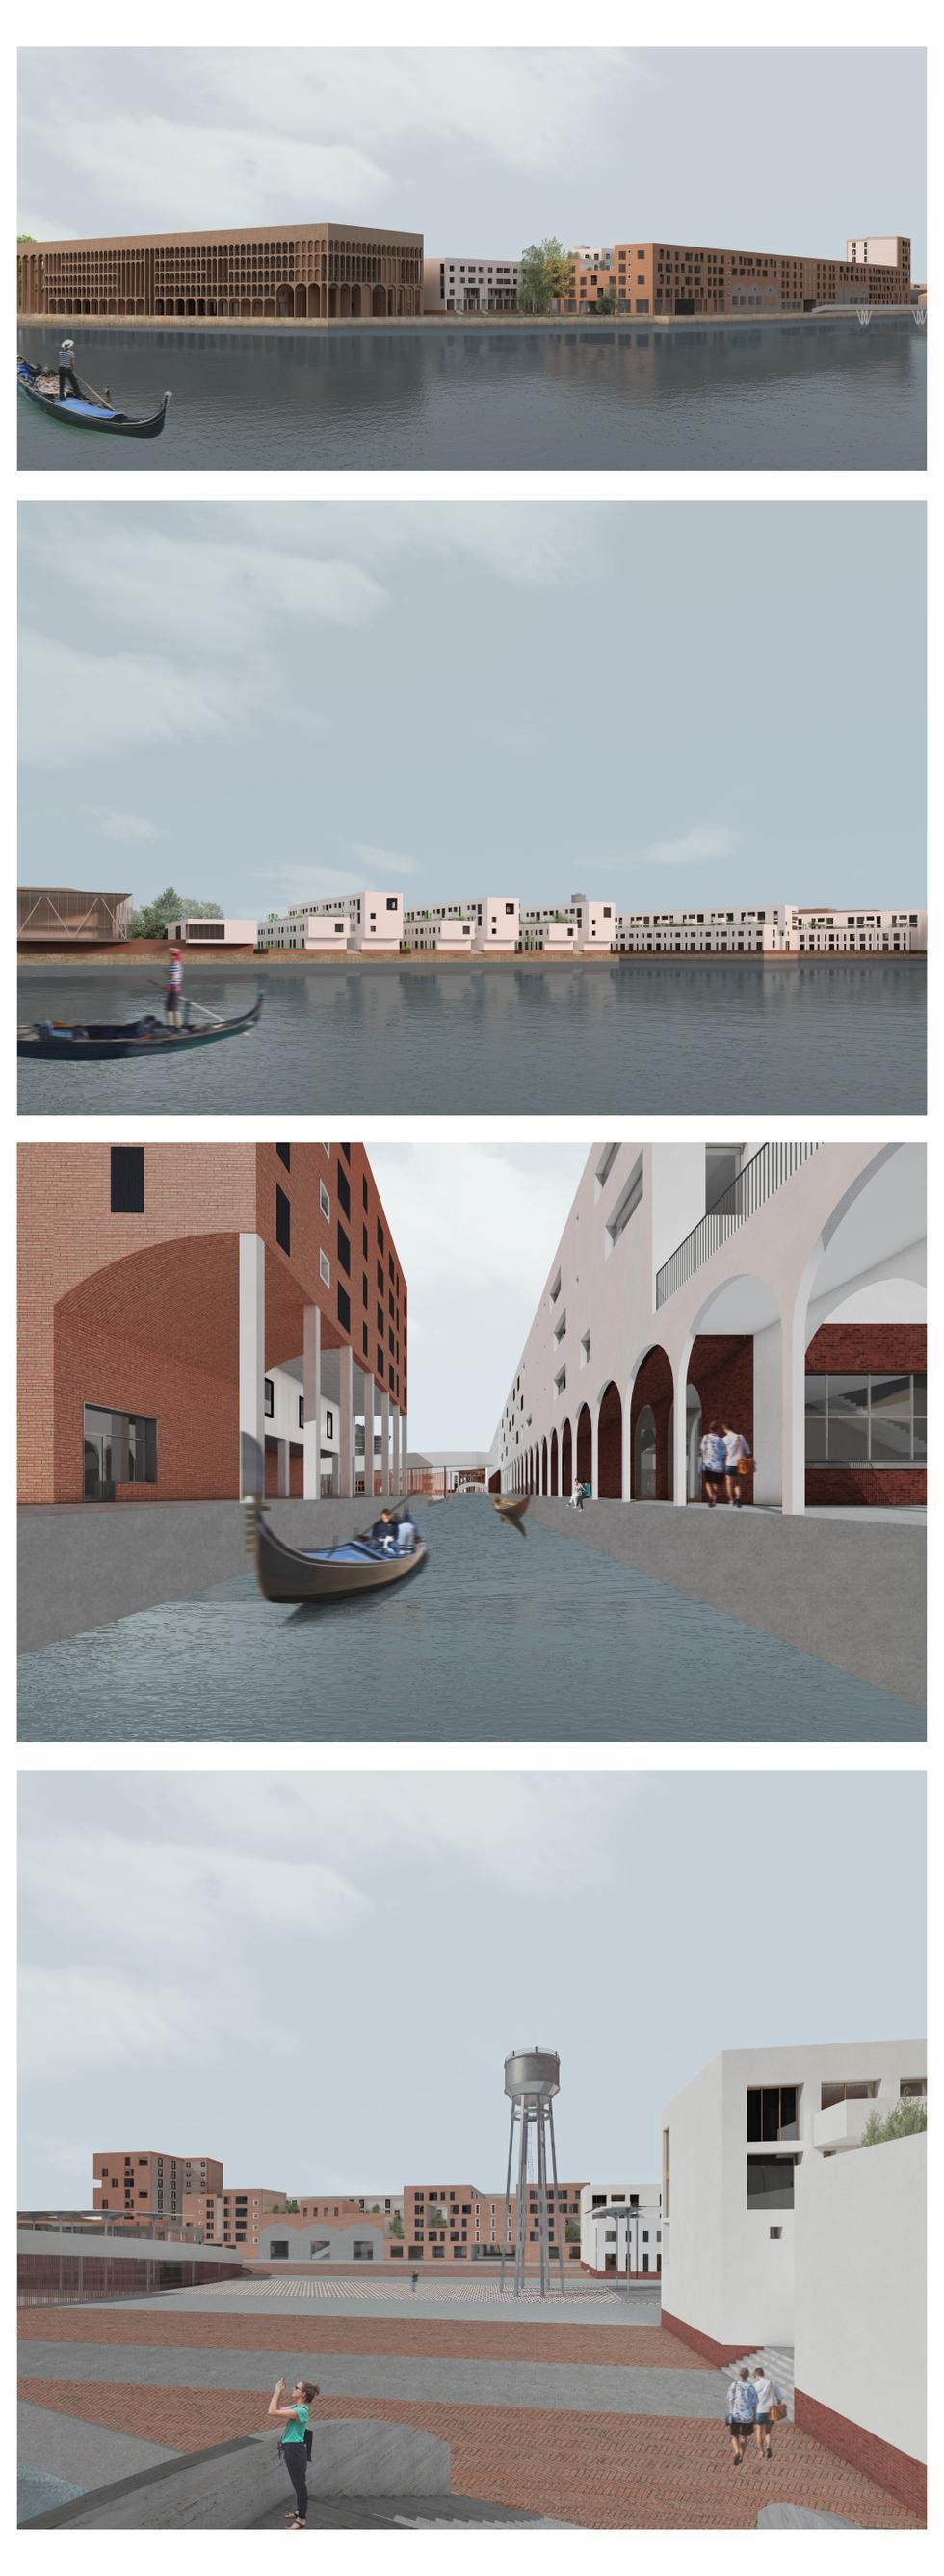 Rehabitating Venice - Social Housing in Venice